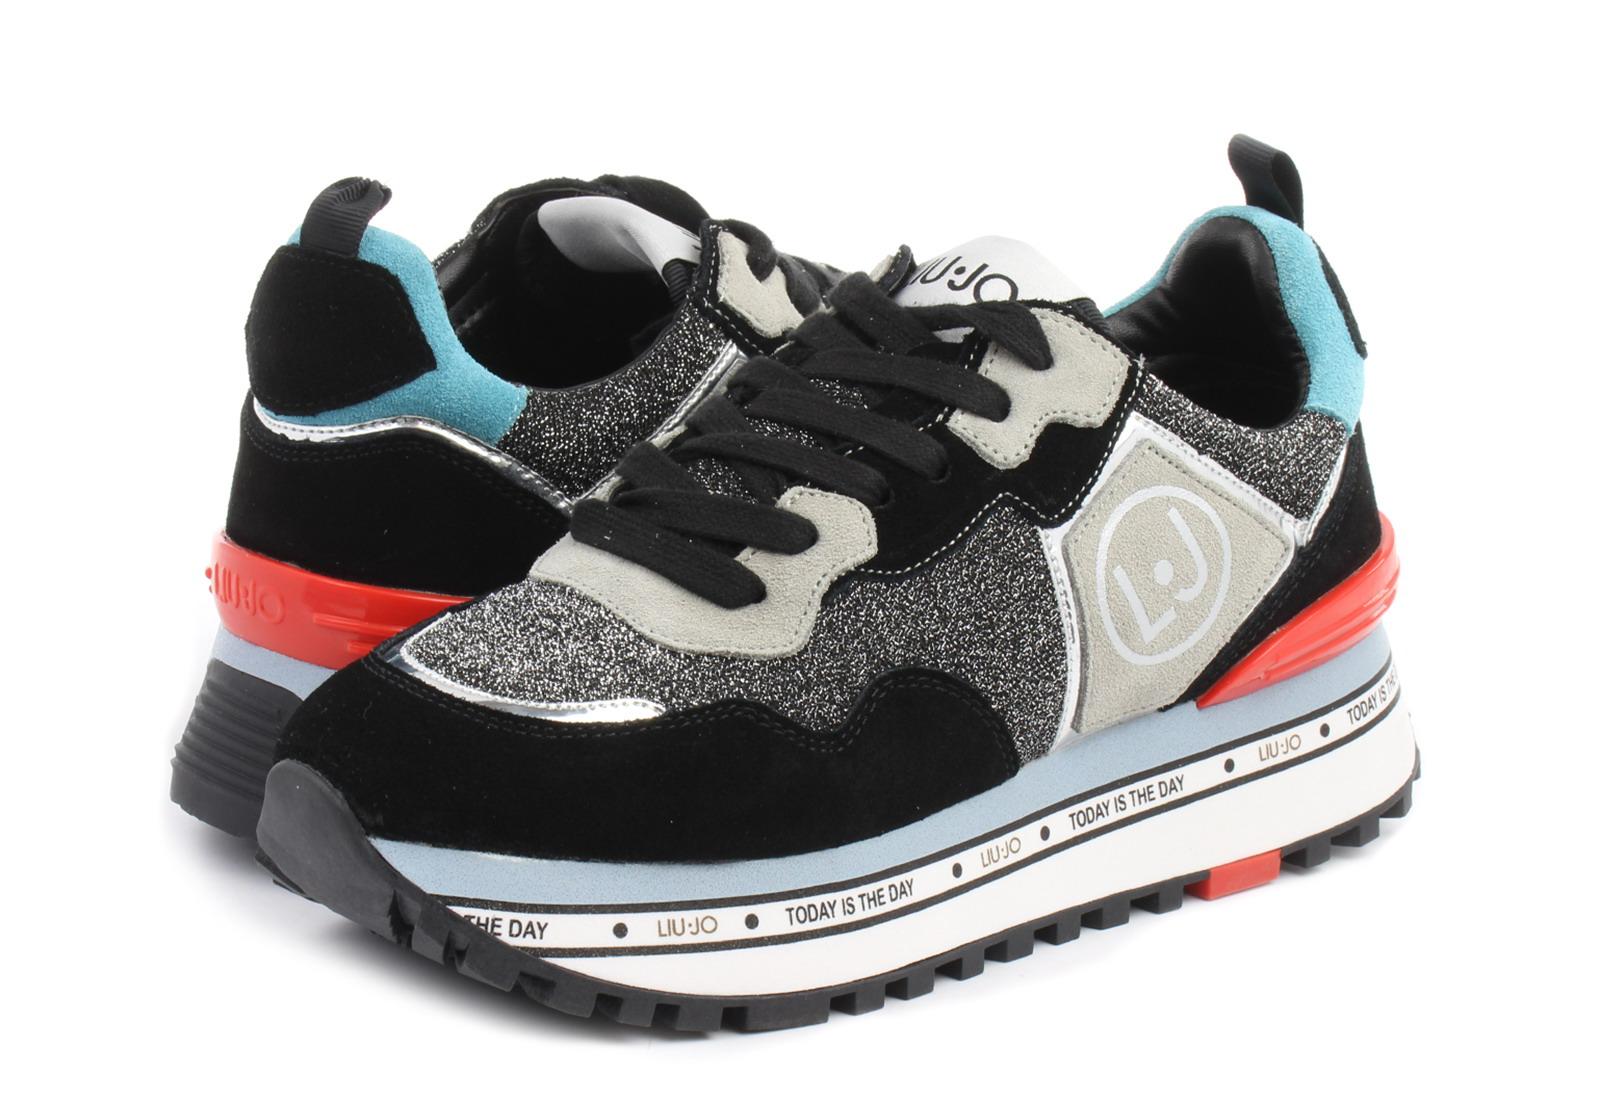 cheaper aa96e a54f1 Liu Jo Shoes - Maxi Alexa - BXX051PX037-BLK - Online shop for sneakers,  shoes and boots